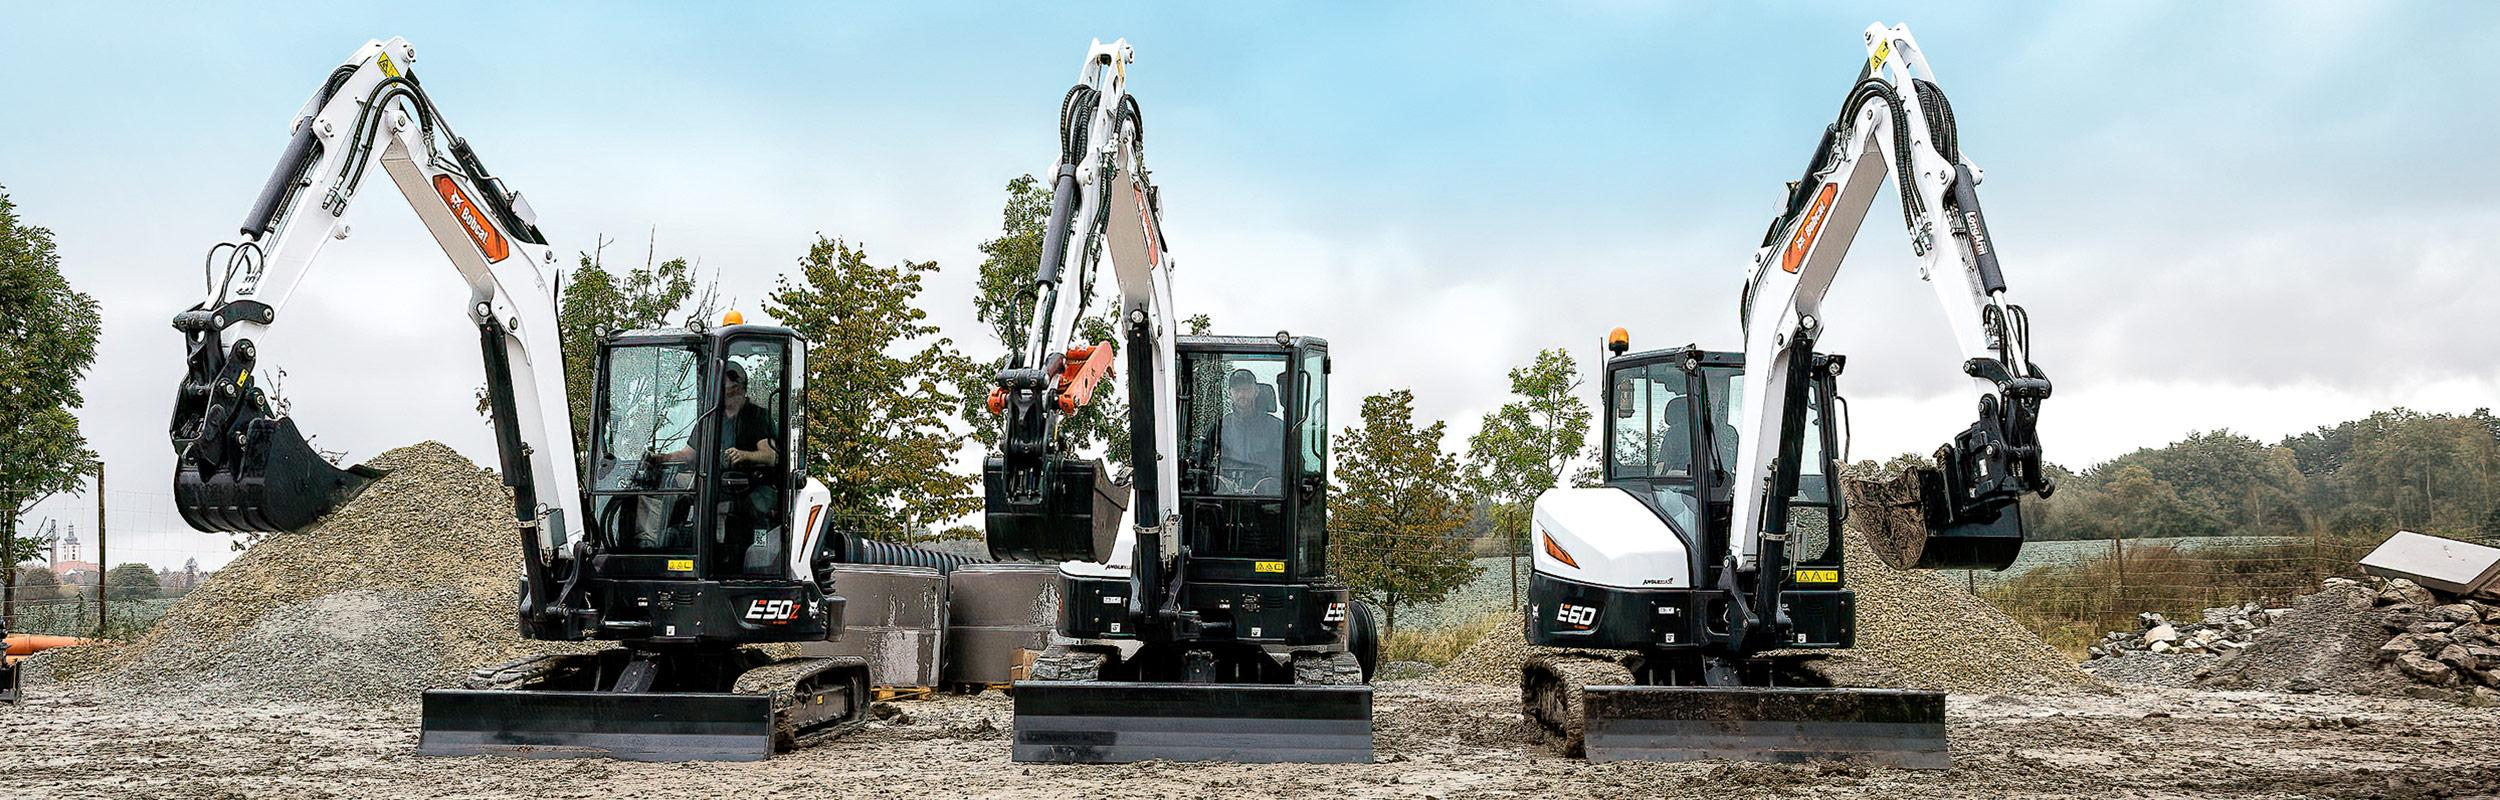 R2-Series Excavators